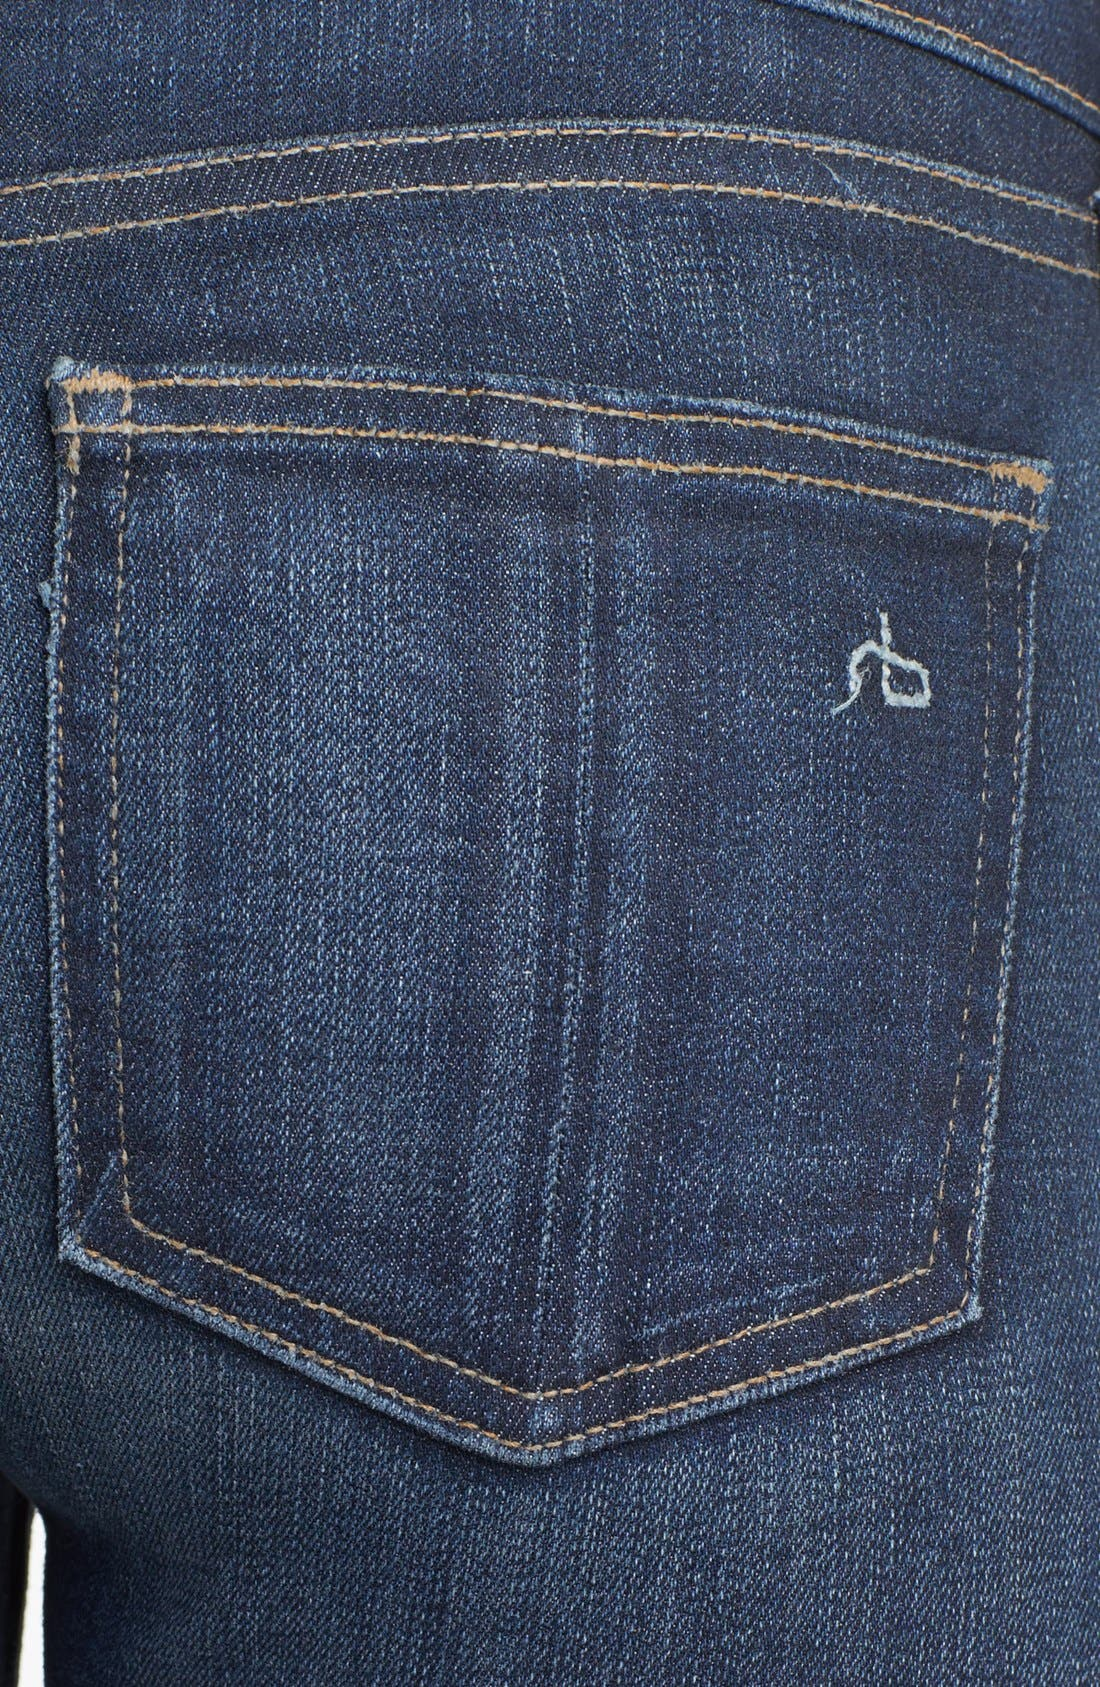 Alternate Image 3  - rag & bone/JEAN Skinny Stretch Jeans (Clean Charing)